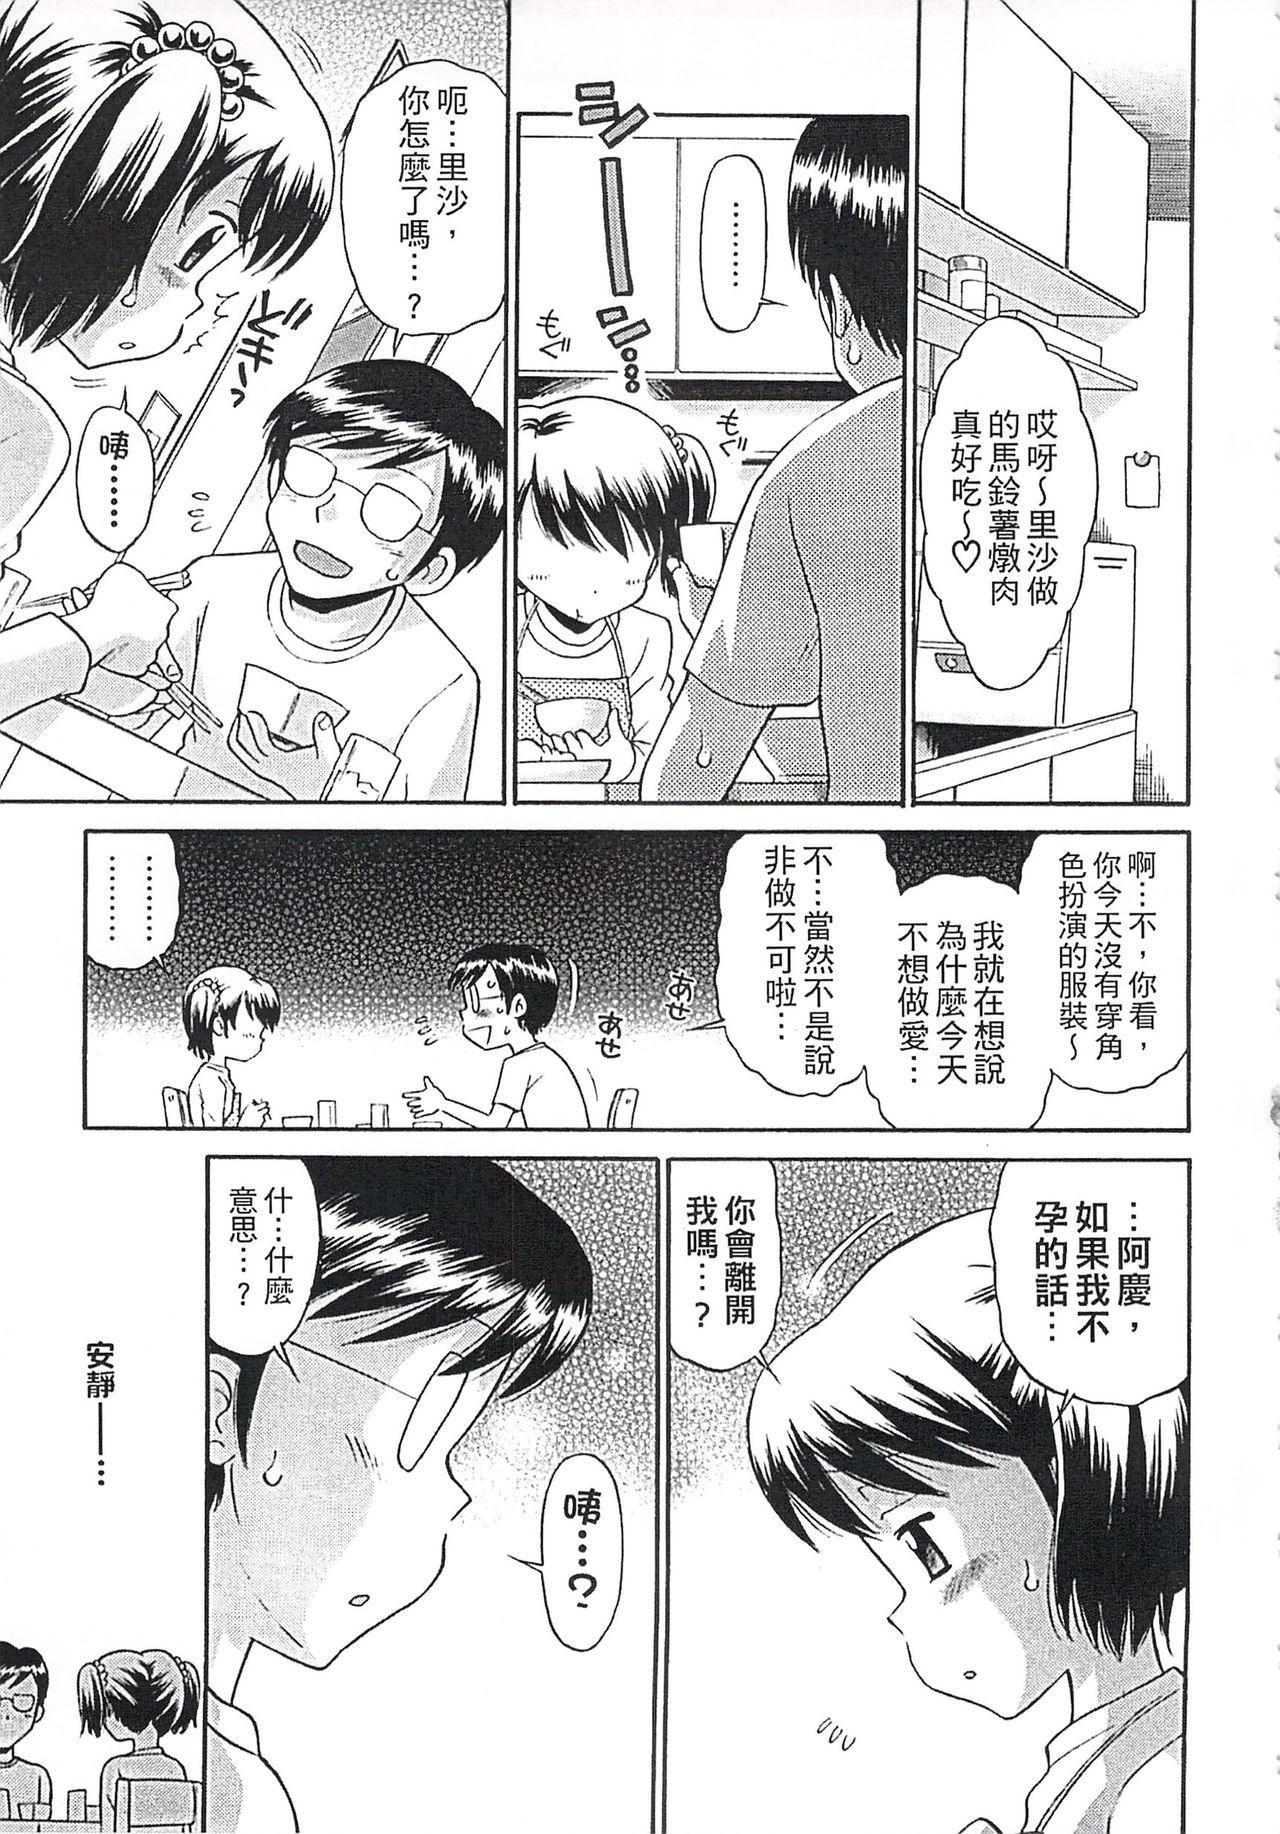 Kore demo Otona Desu Kedo!? Mrs.LOLITA Kanzenban   人家是大人啦! ~Mrs.LOLITA完全版 66